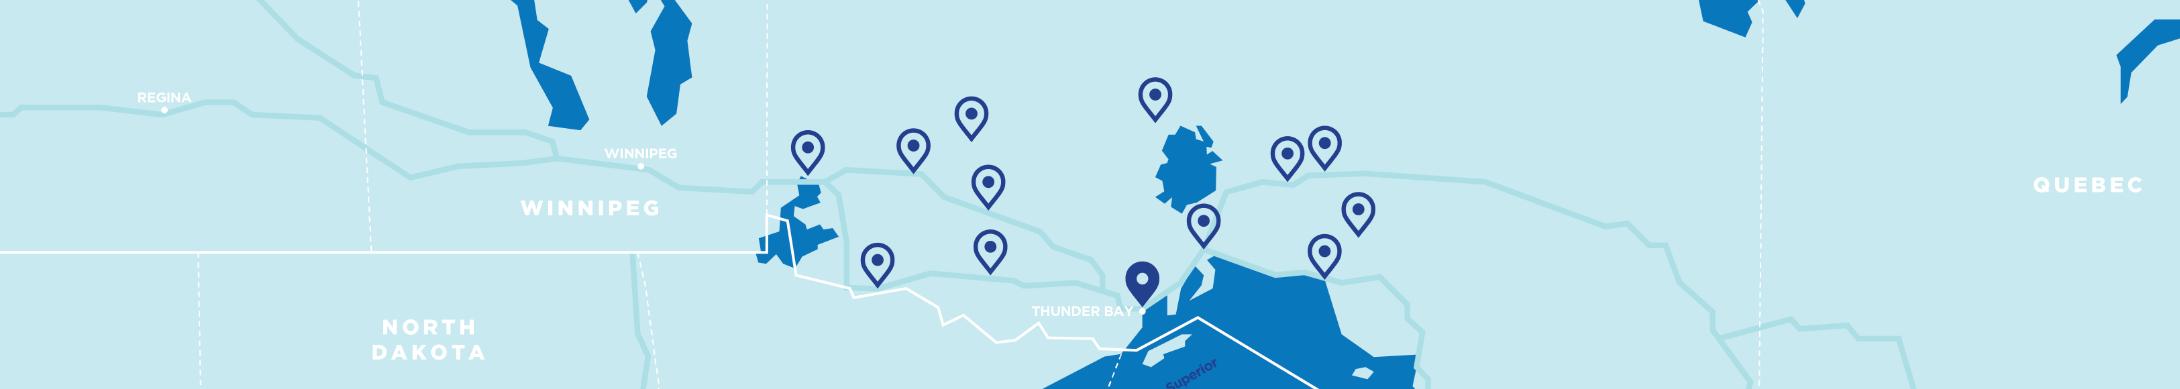 Map of Thunder Bay